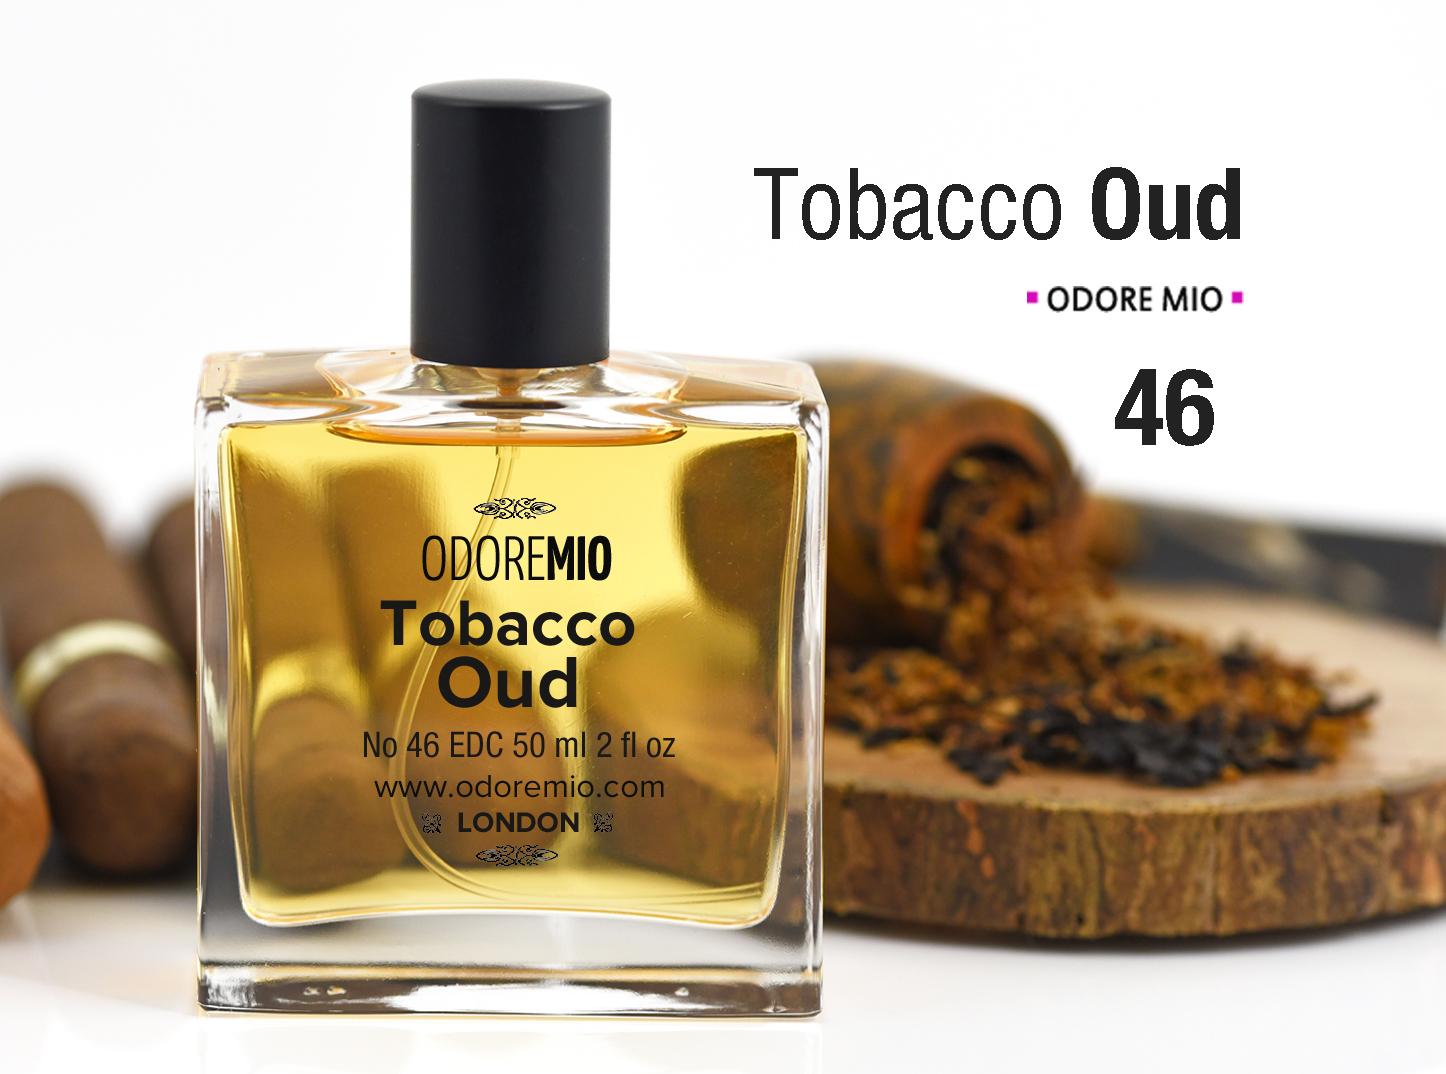 Tobacco Oud Eau de Cologne Perfume